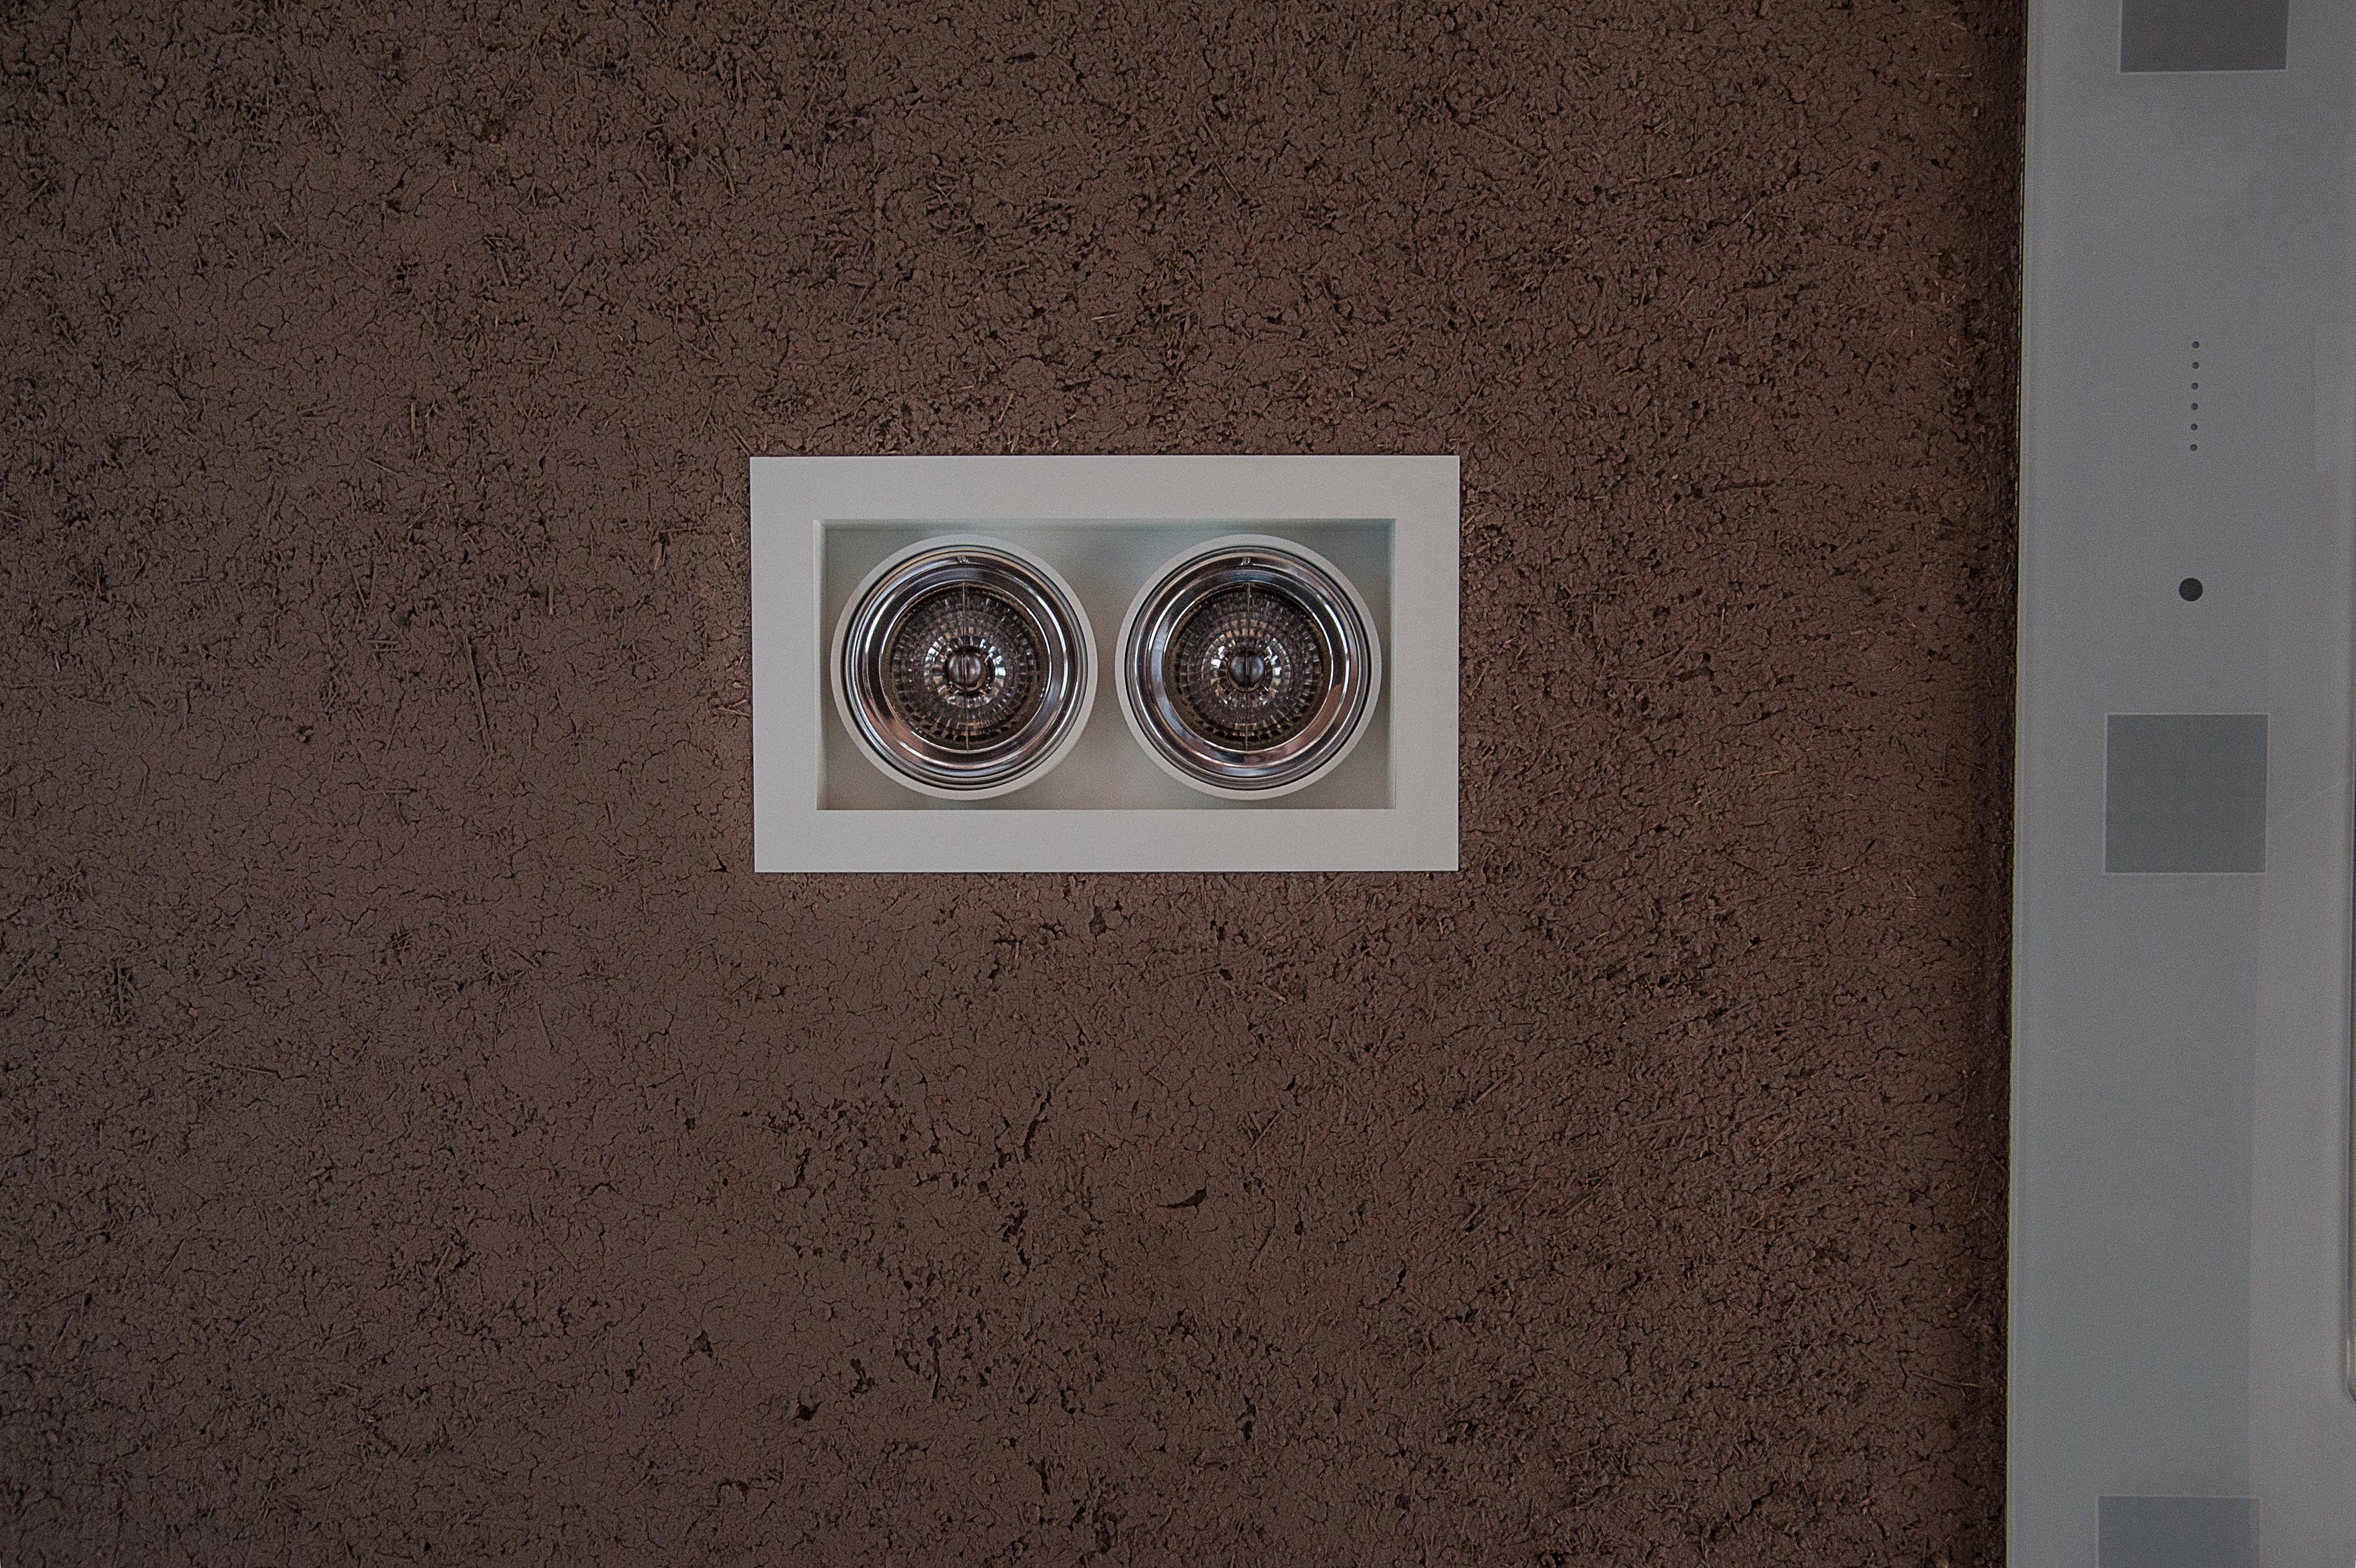 lehmputz kosten gallery of aussenwand dammen aussenwand dammen with verputzen kosten with. Black Bedroom Furniture Sets. Home Design Ideas